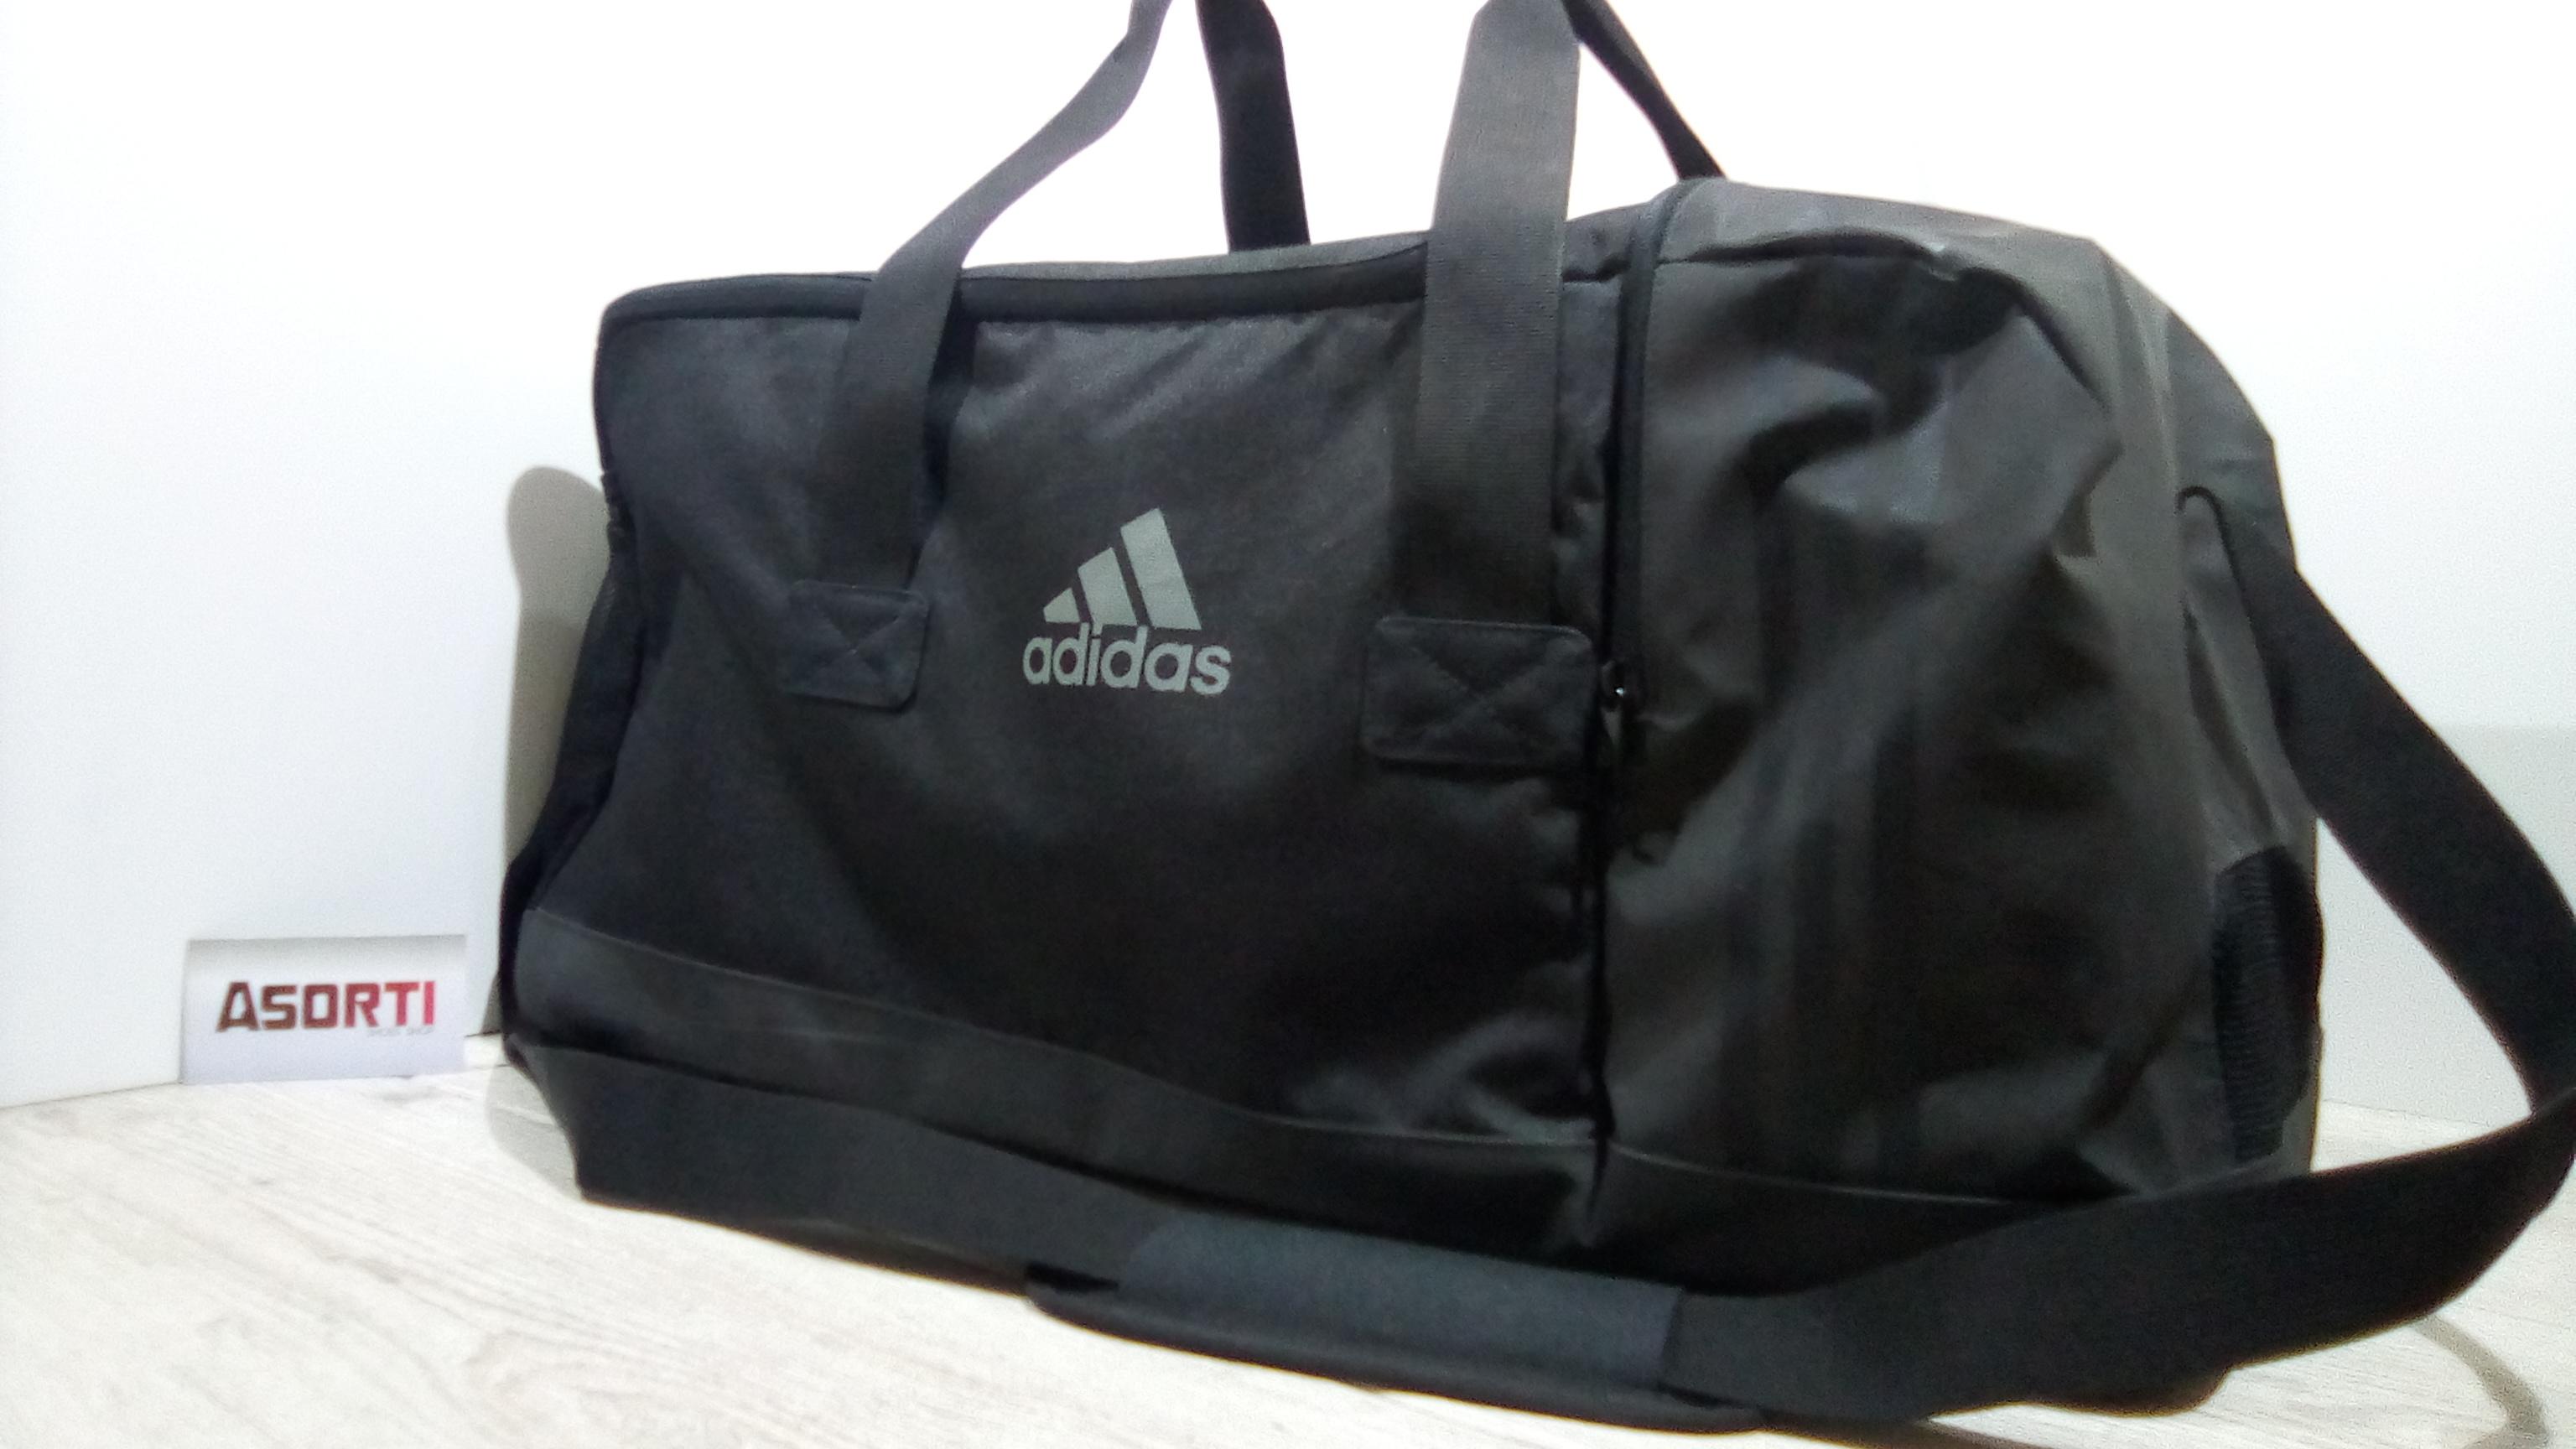 318e56cd03e6 Черная спортивная сумка Adidas 3S PER TB M (AJ9993) купить в Украине ...